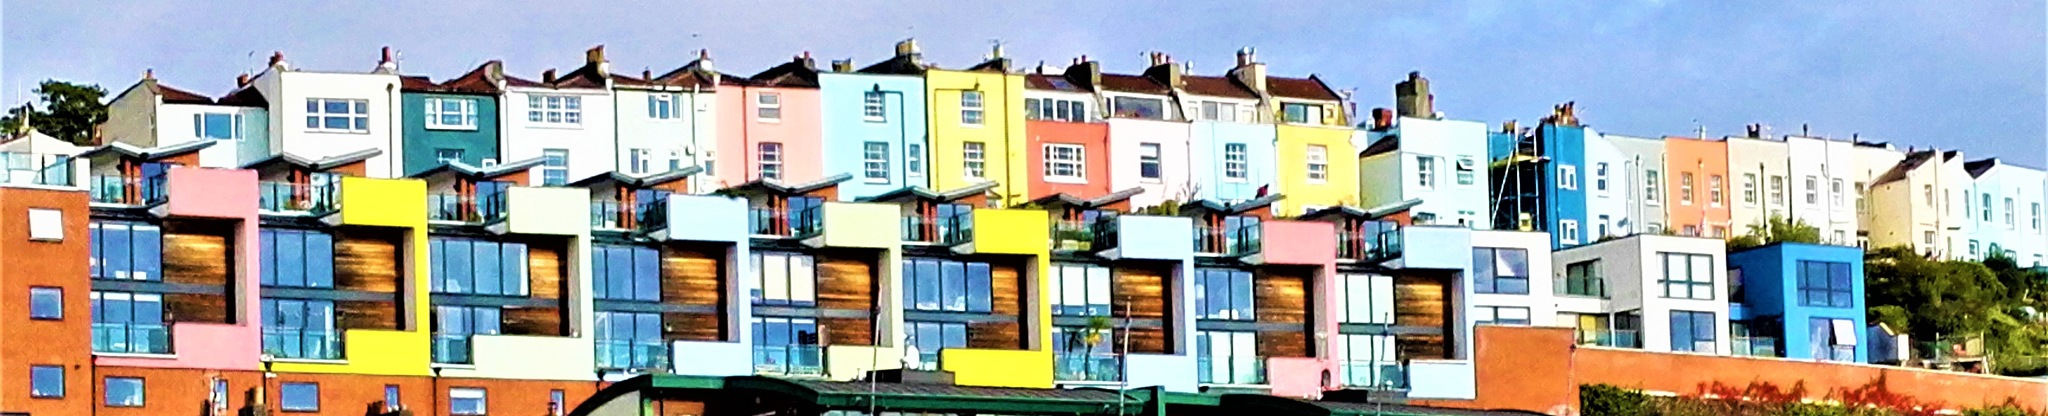 Bristol Colours by ............................. Julian.G.Hicks